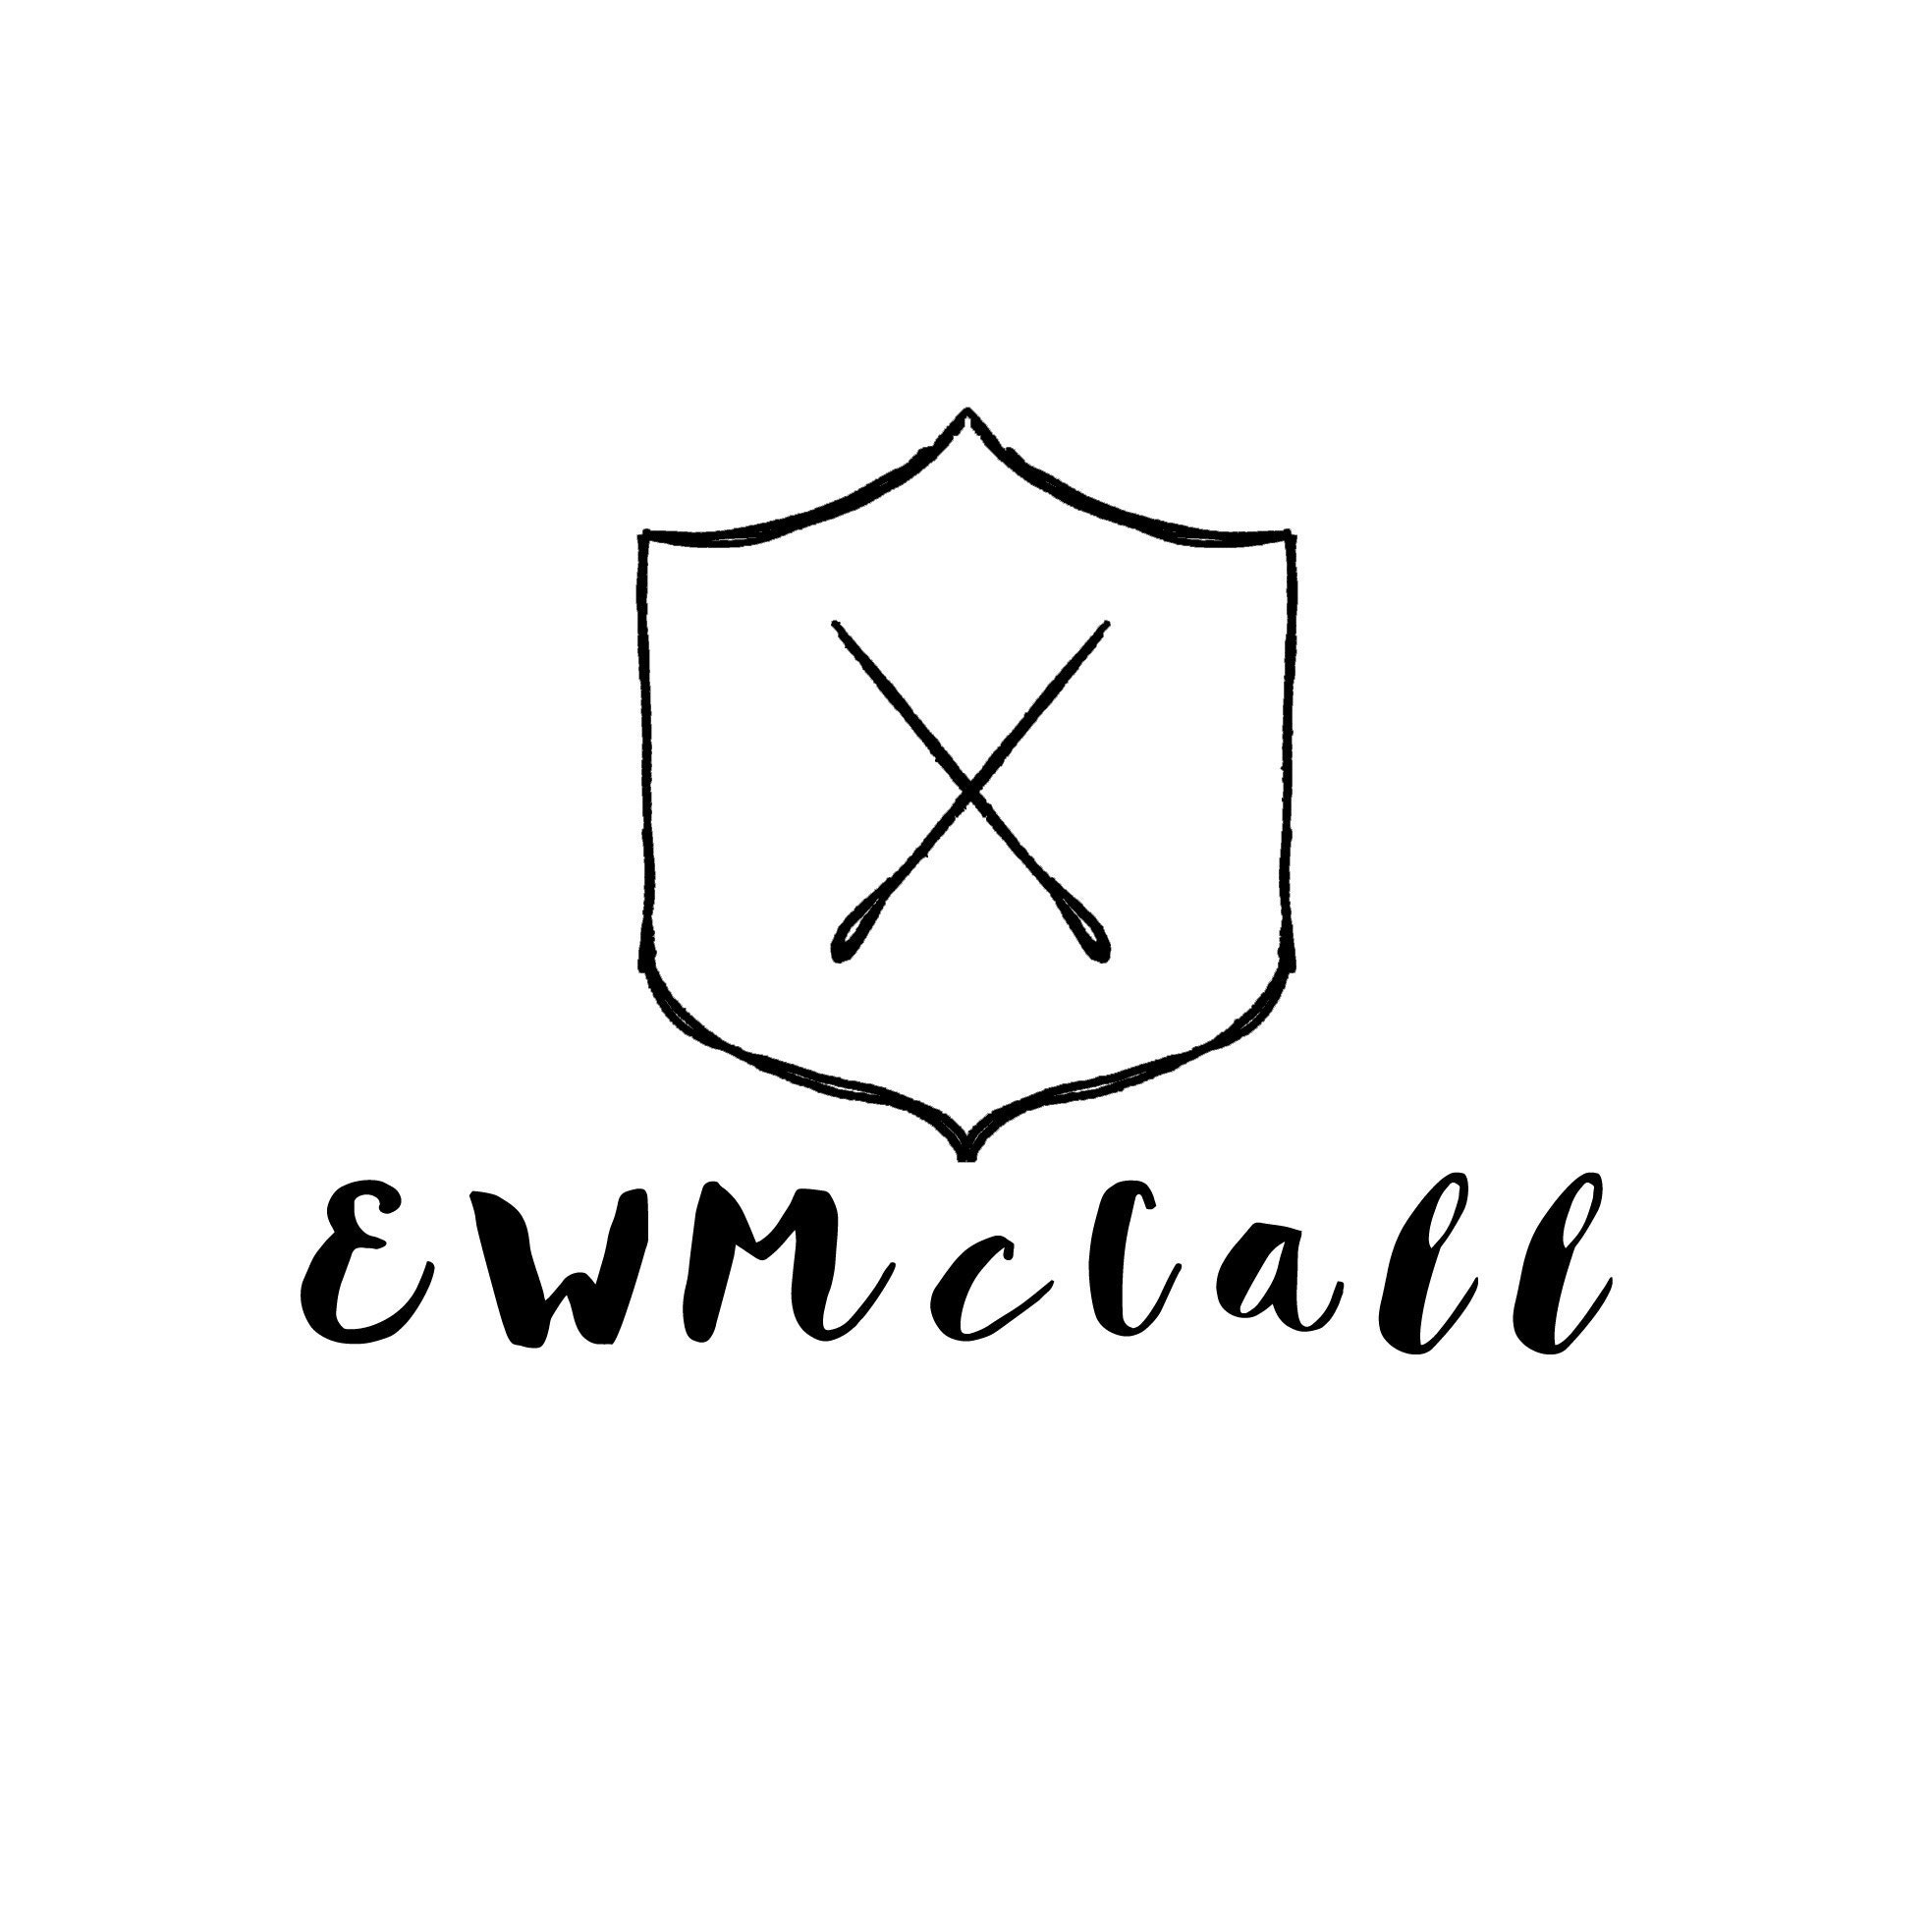 EWMcCall